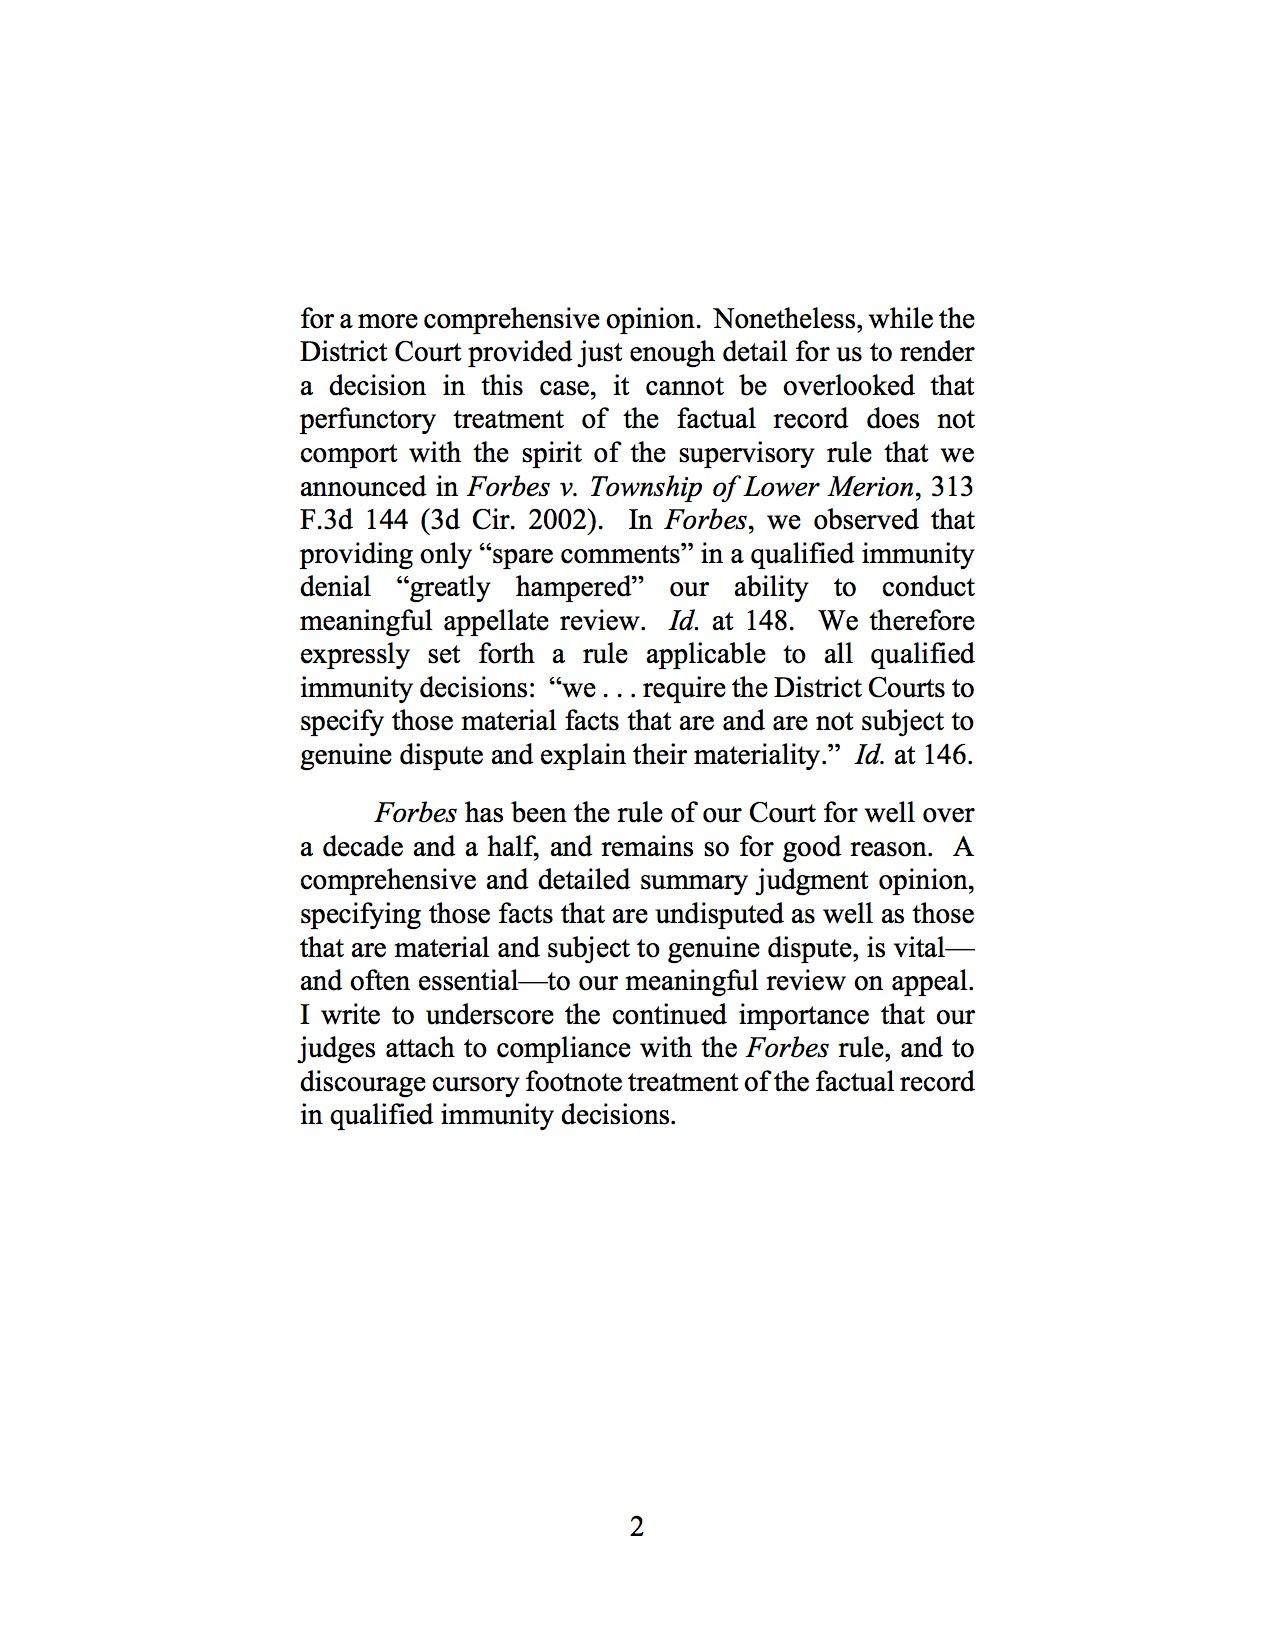 E.D. v. Sharkey 3rd Circuit Opinion.16.jpg